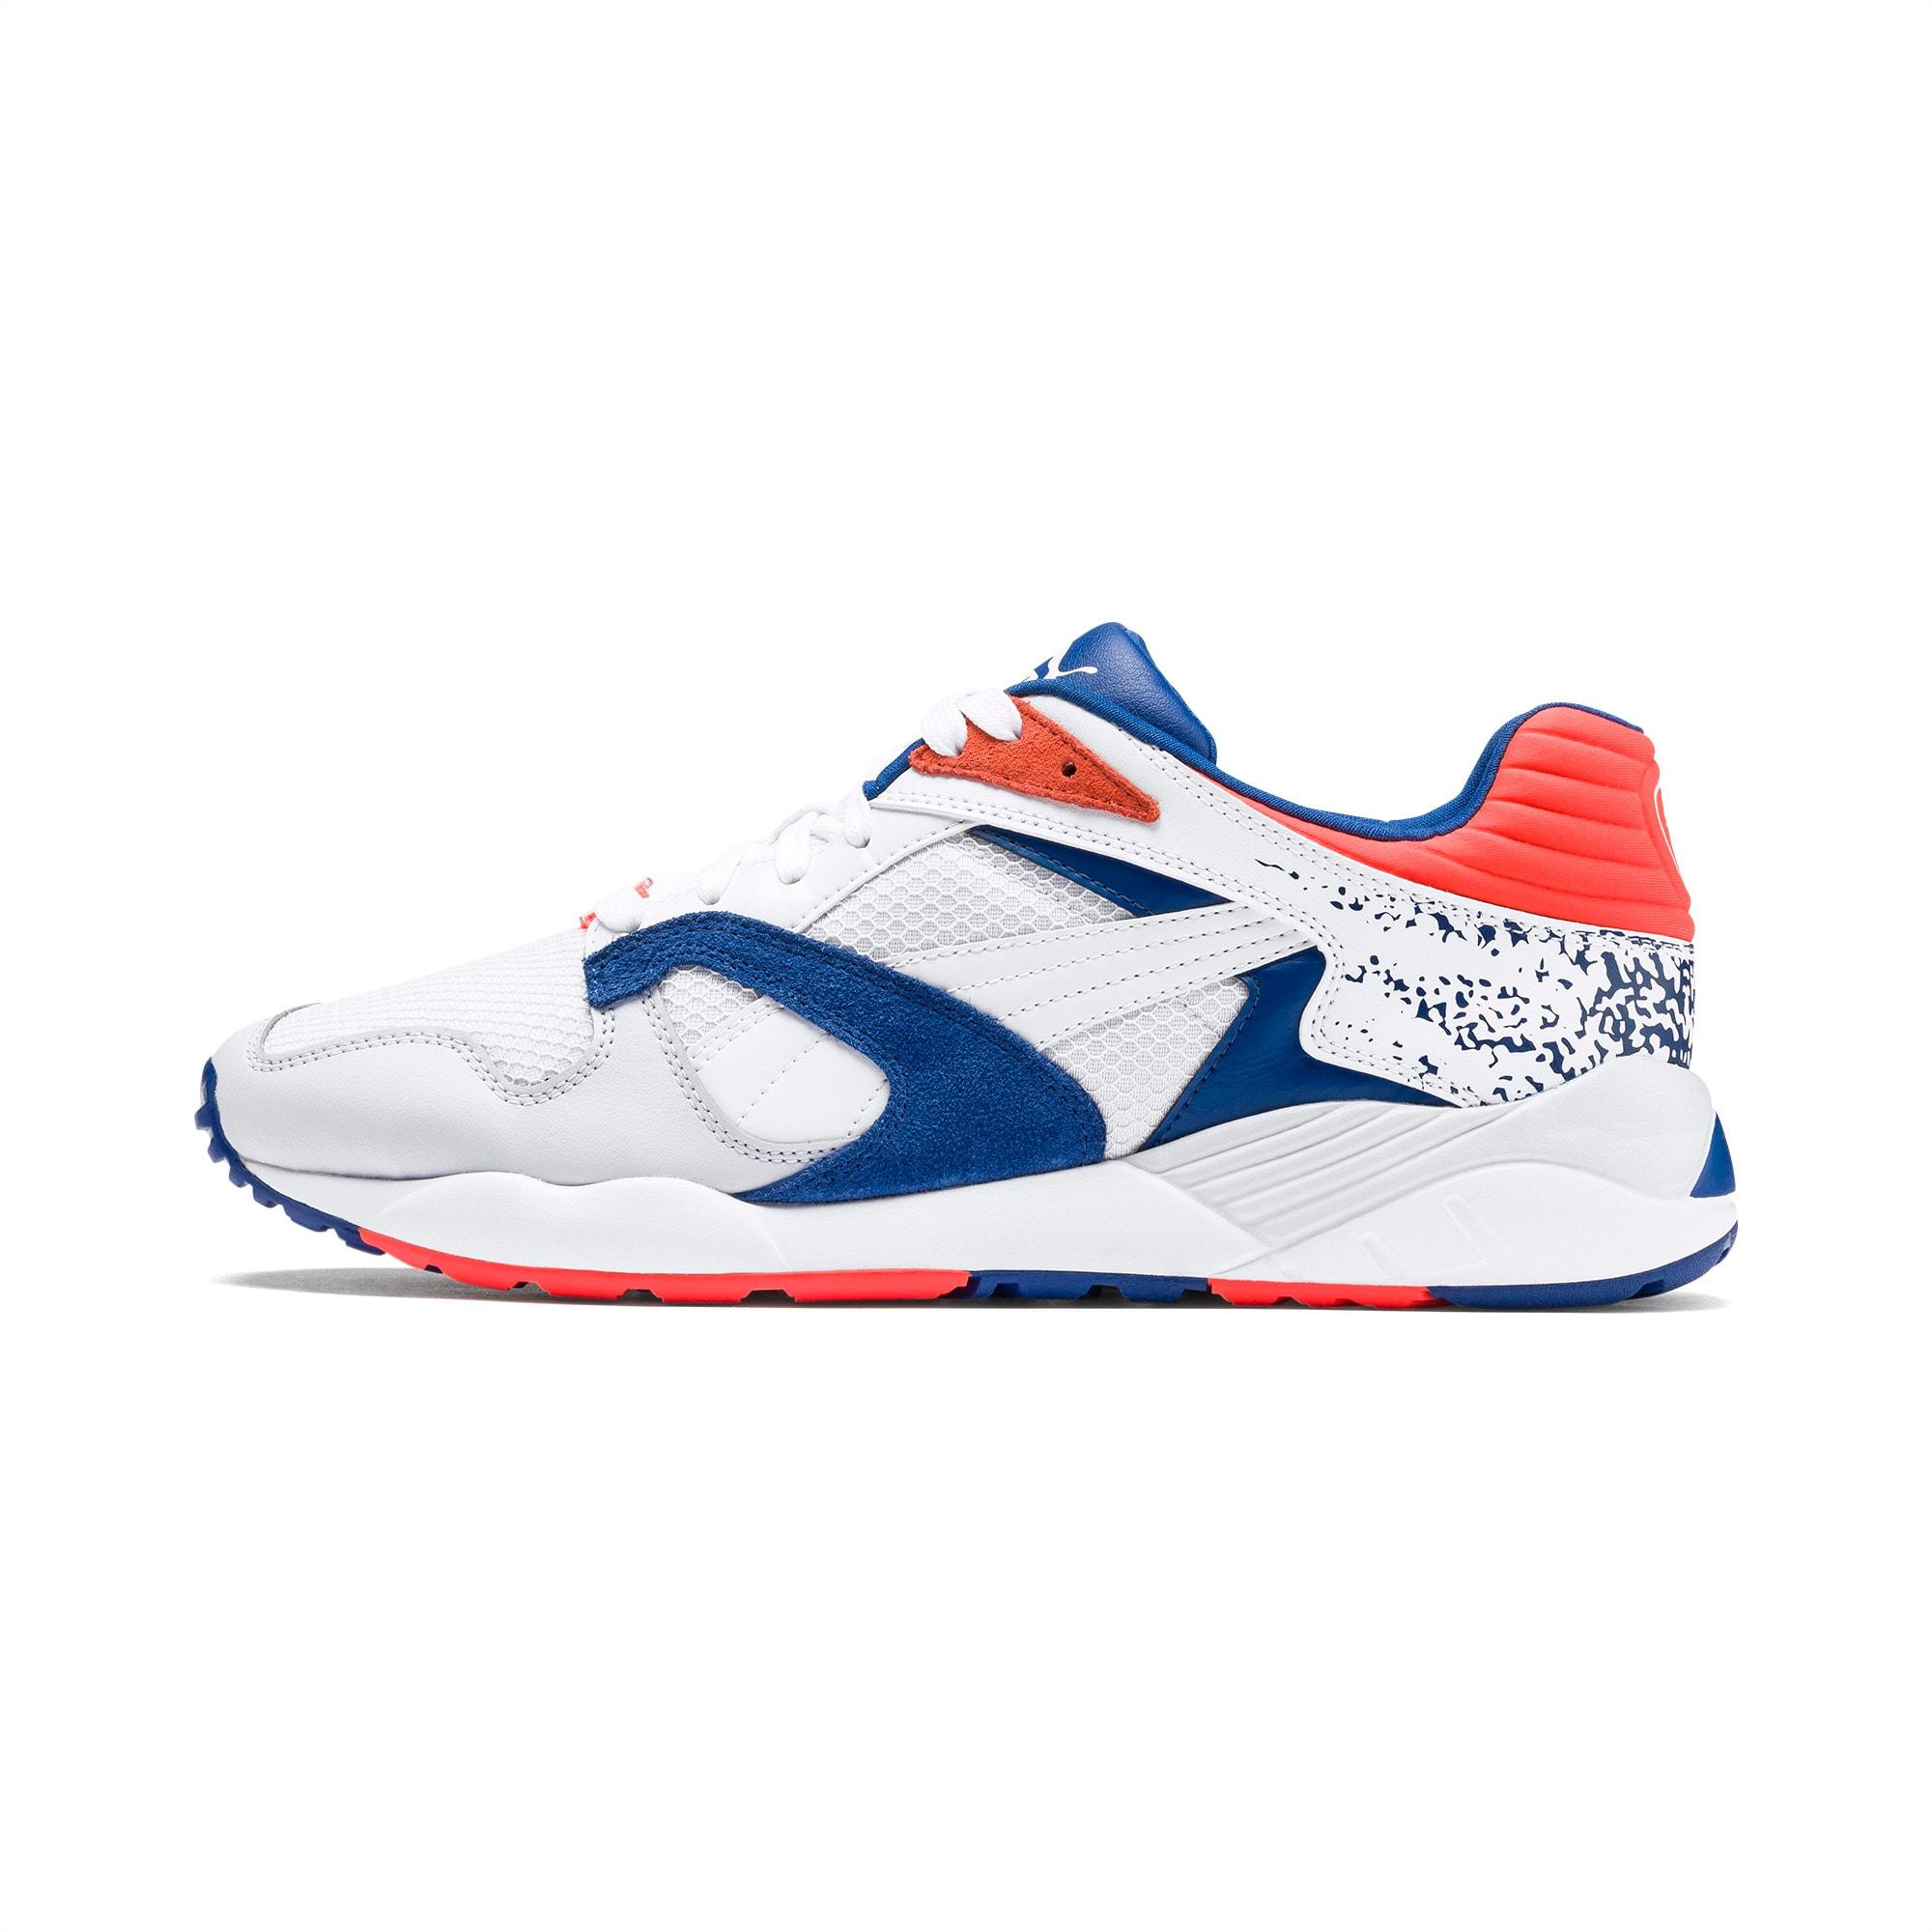 Trinomic XS-850 Sneakers